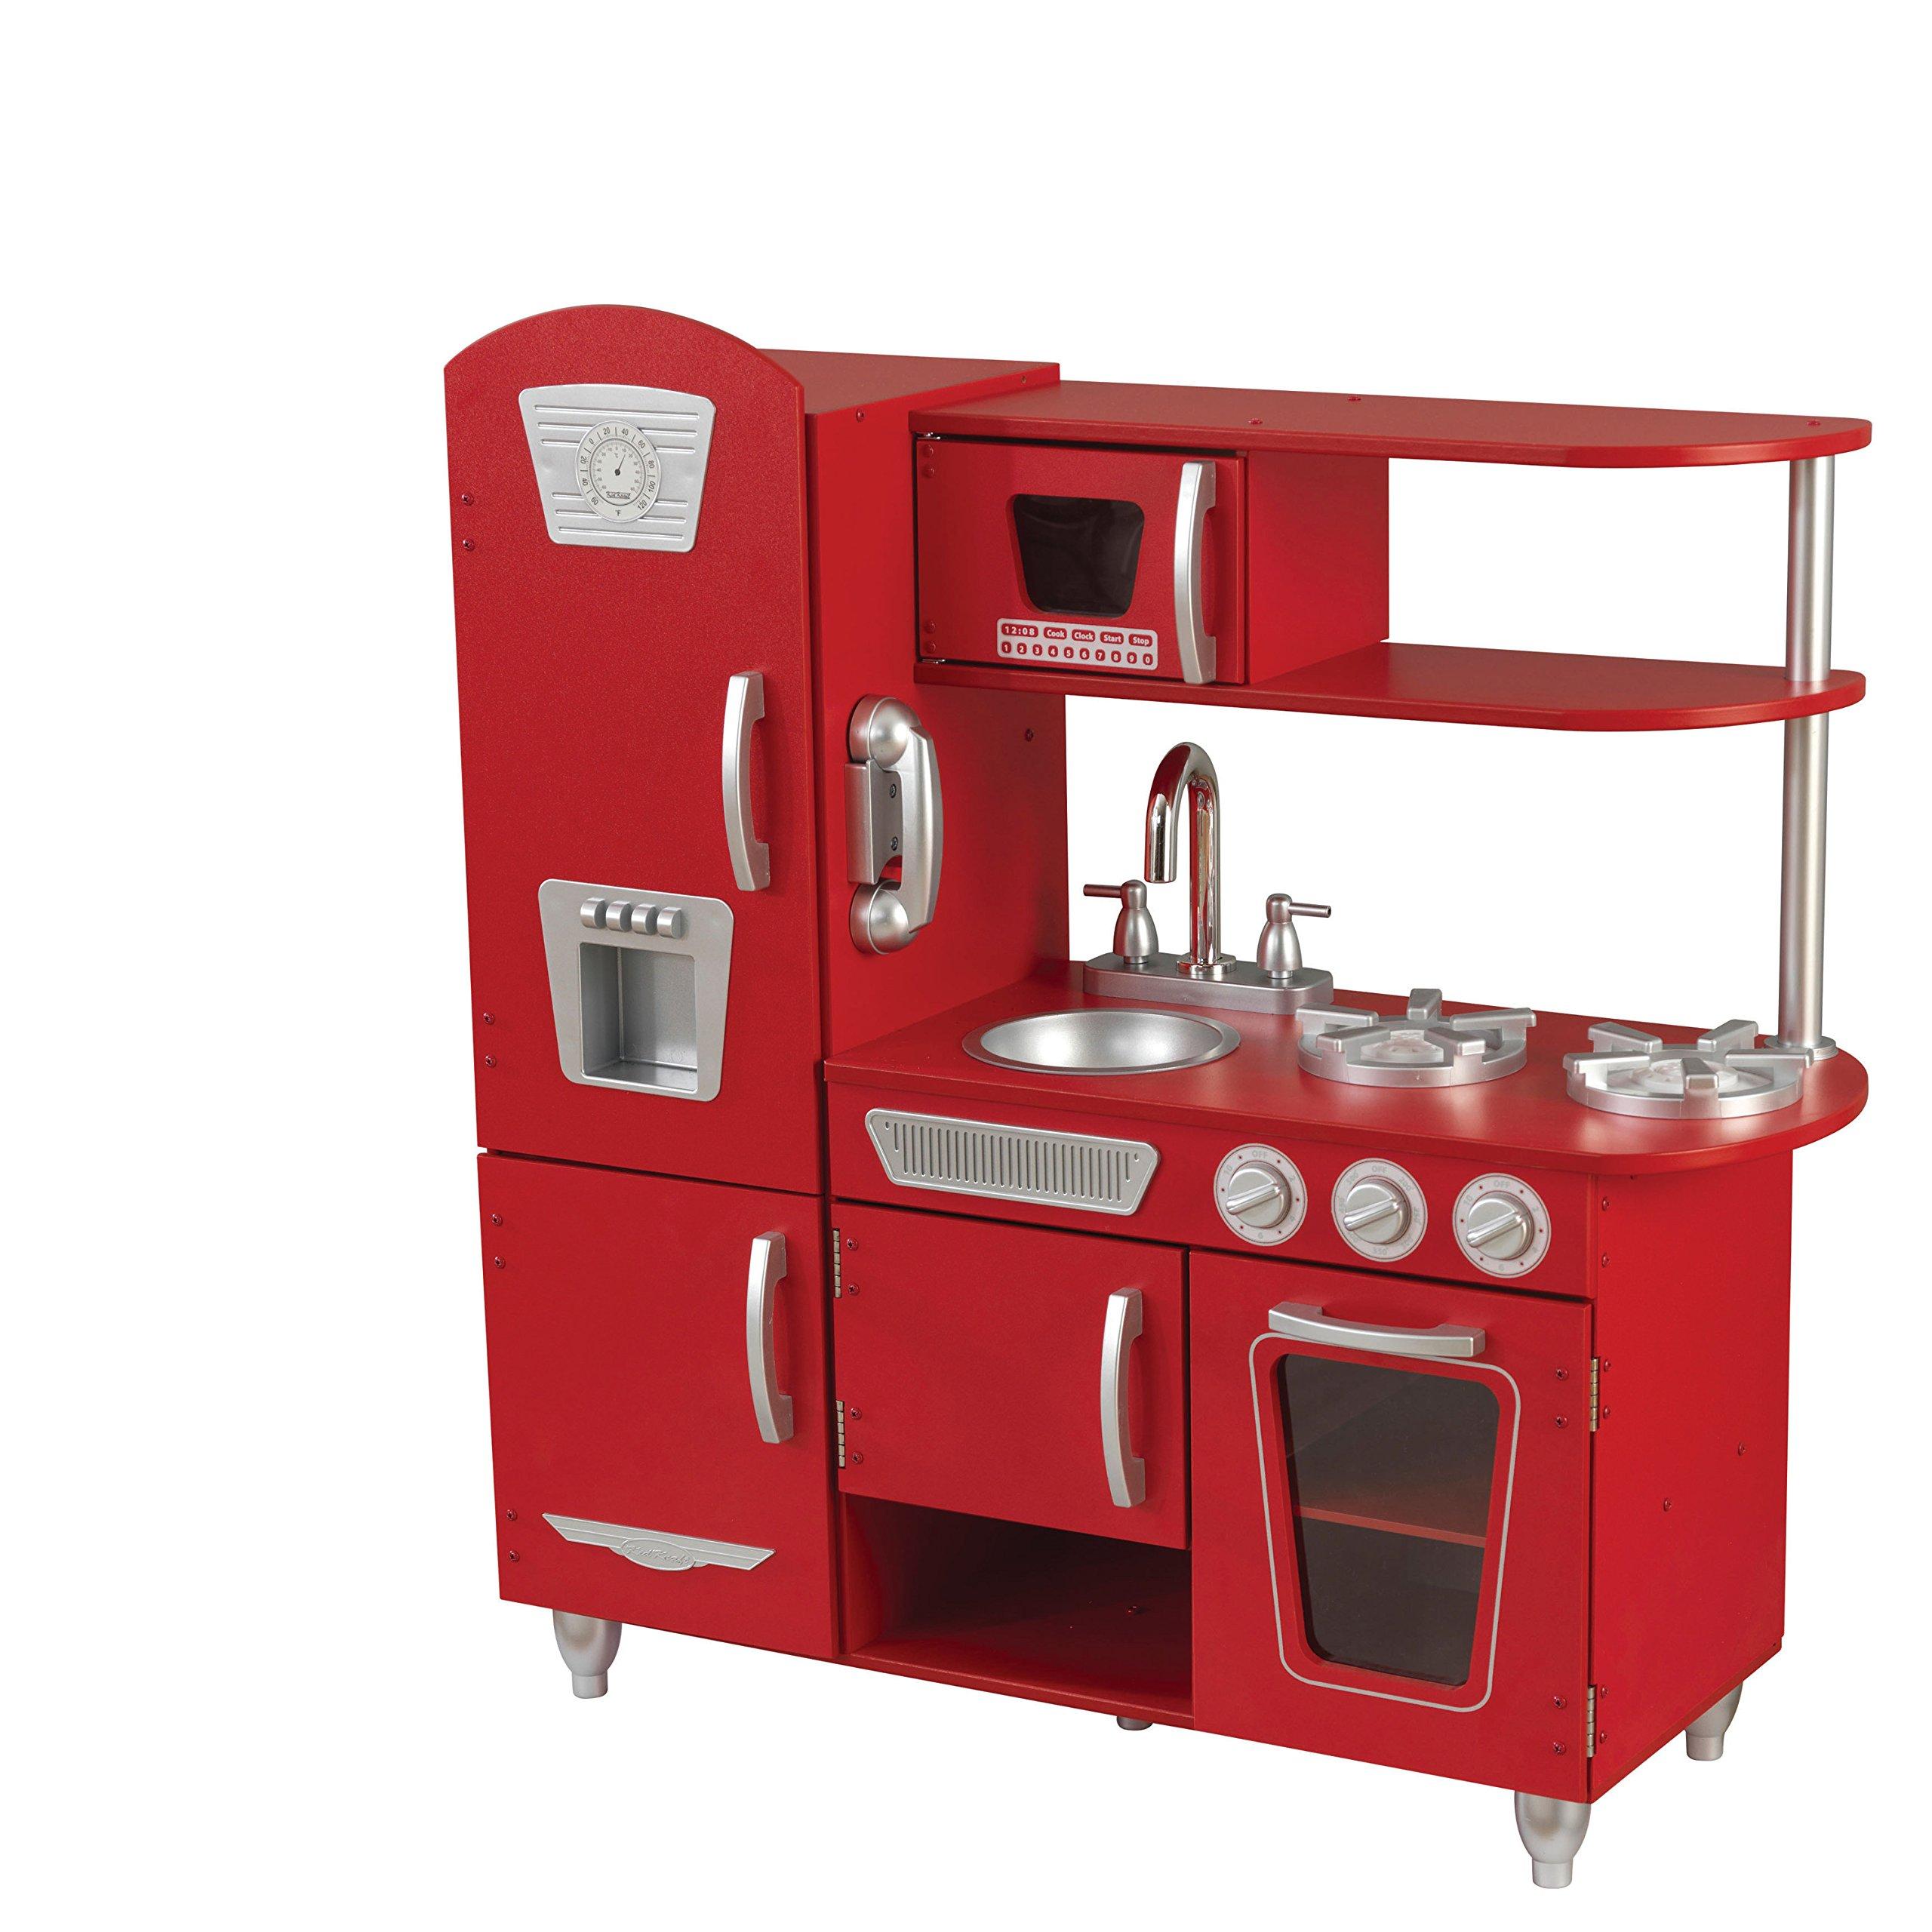 KidKraft Vintage Play Kitchen - Red by KidKraft (Image #4)